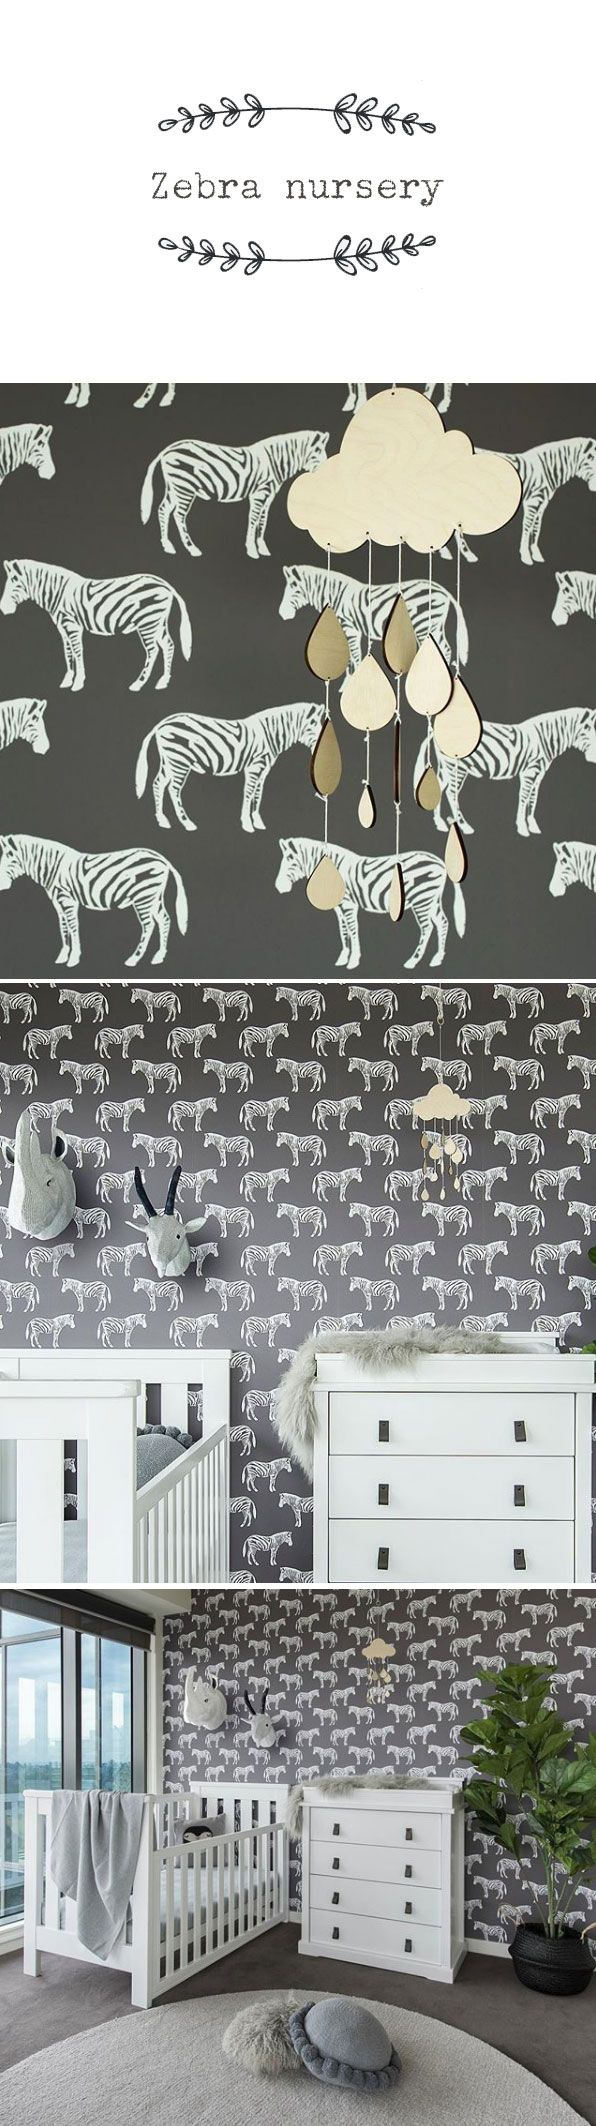 gorgeous nursery by @littlelibertyrooms 💙 for @mintymagazine #interiors #interiorinspiration #interiordesign #interiordesigninspiration #interiorinspo #design #designers #designphotography #designinspo #interiordesigninspo #interiorphotography #colour #children #animals #baby #babies #cushions #fiddleleaffig #grey #melbourne #melbournephotographer #nikon #nikonphotography #kidsinteriors #kidsinteriordesign #kidsinteriorsinspo #nursery #nurseryinspo #b